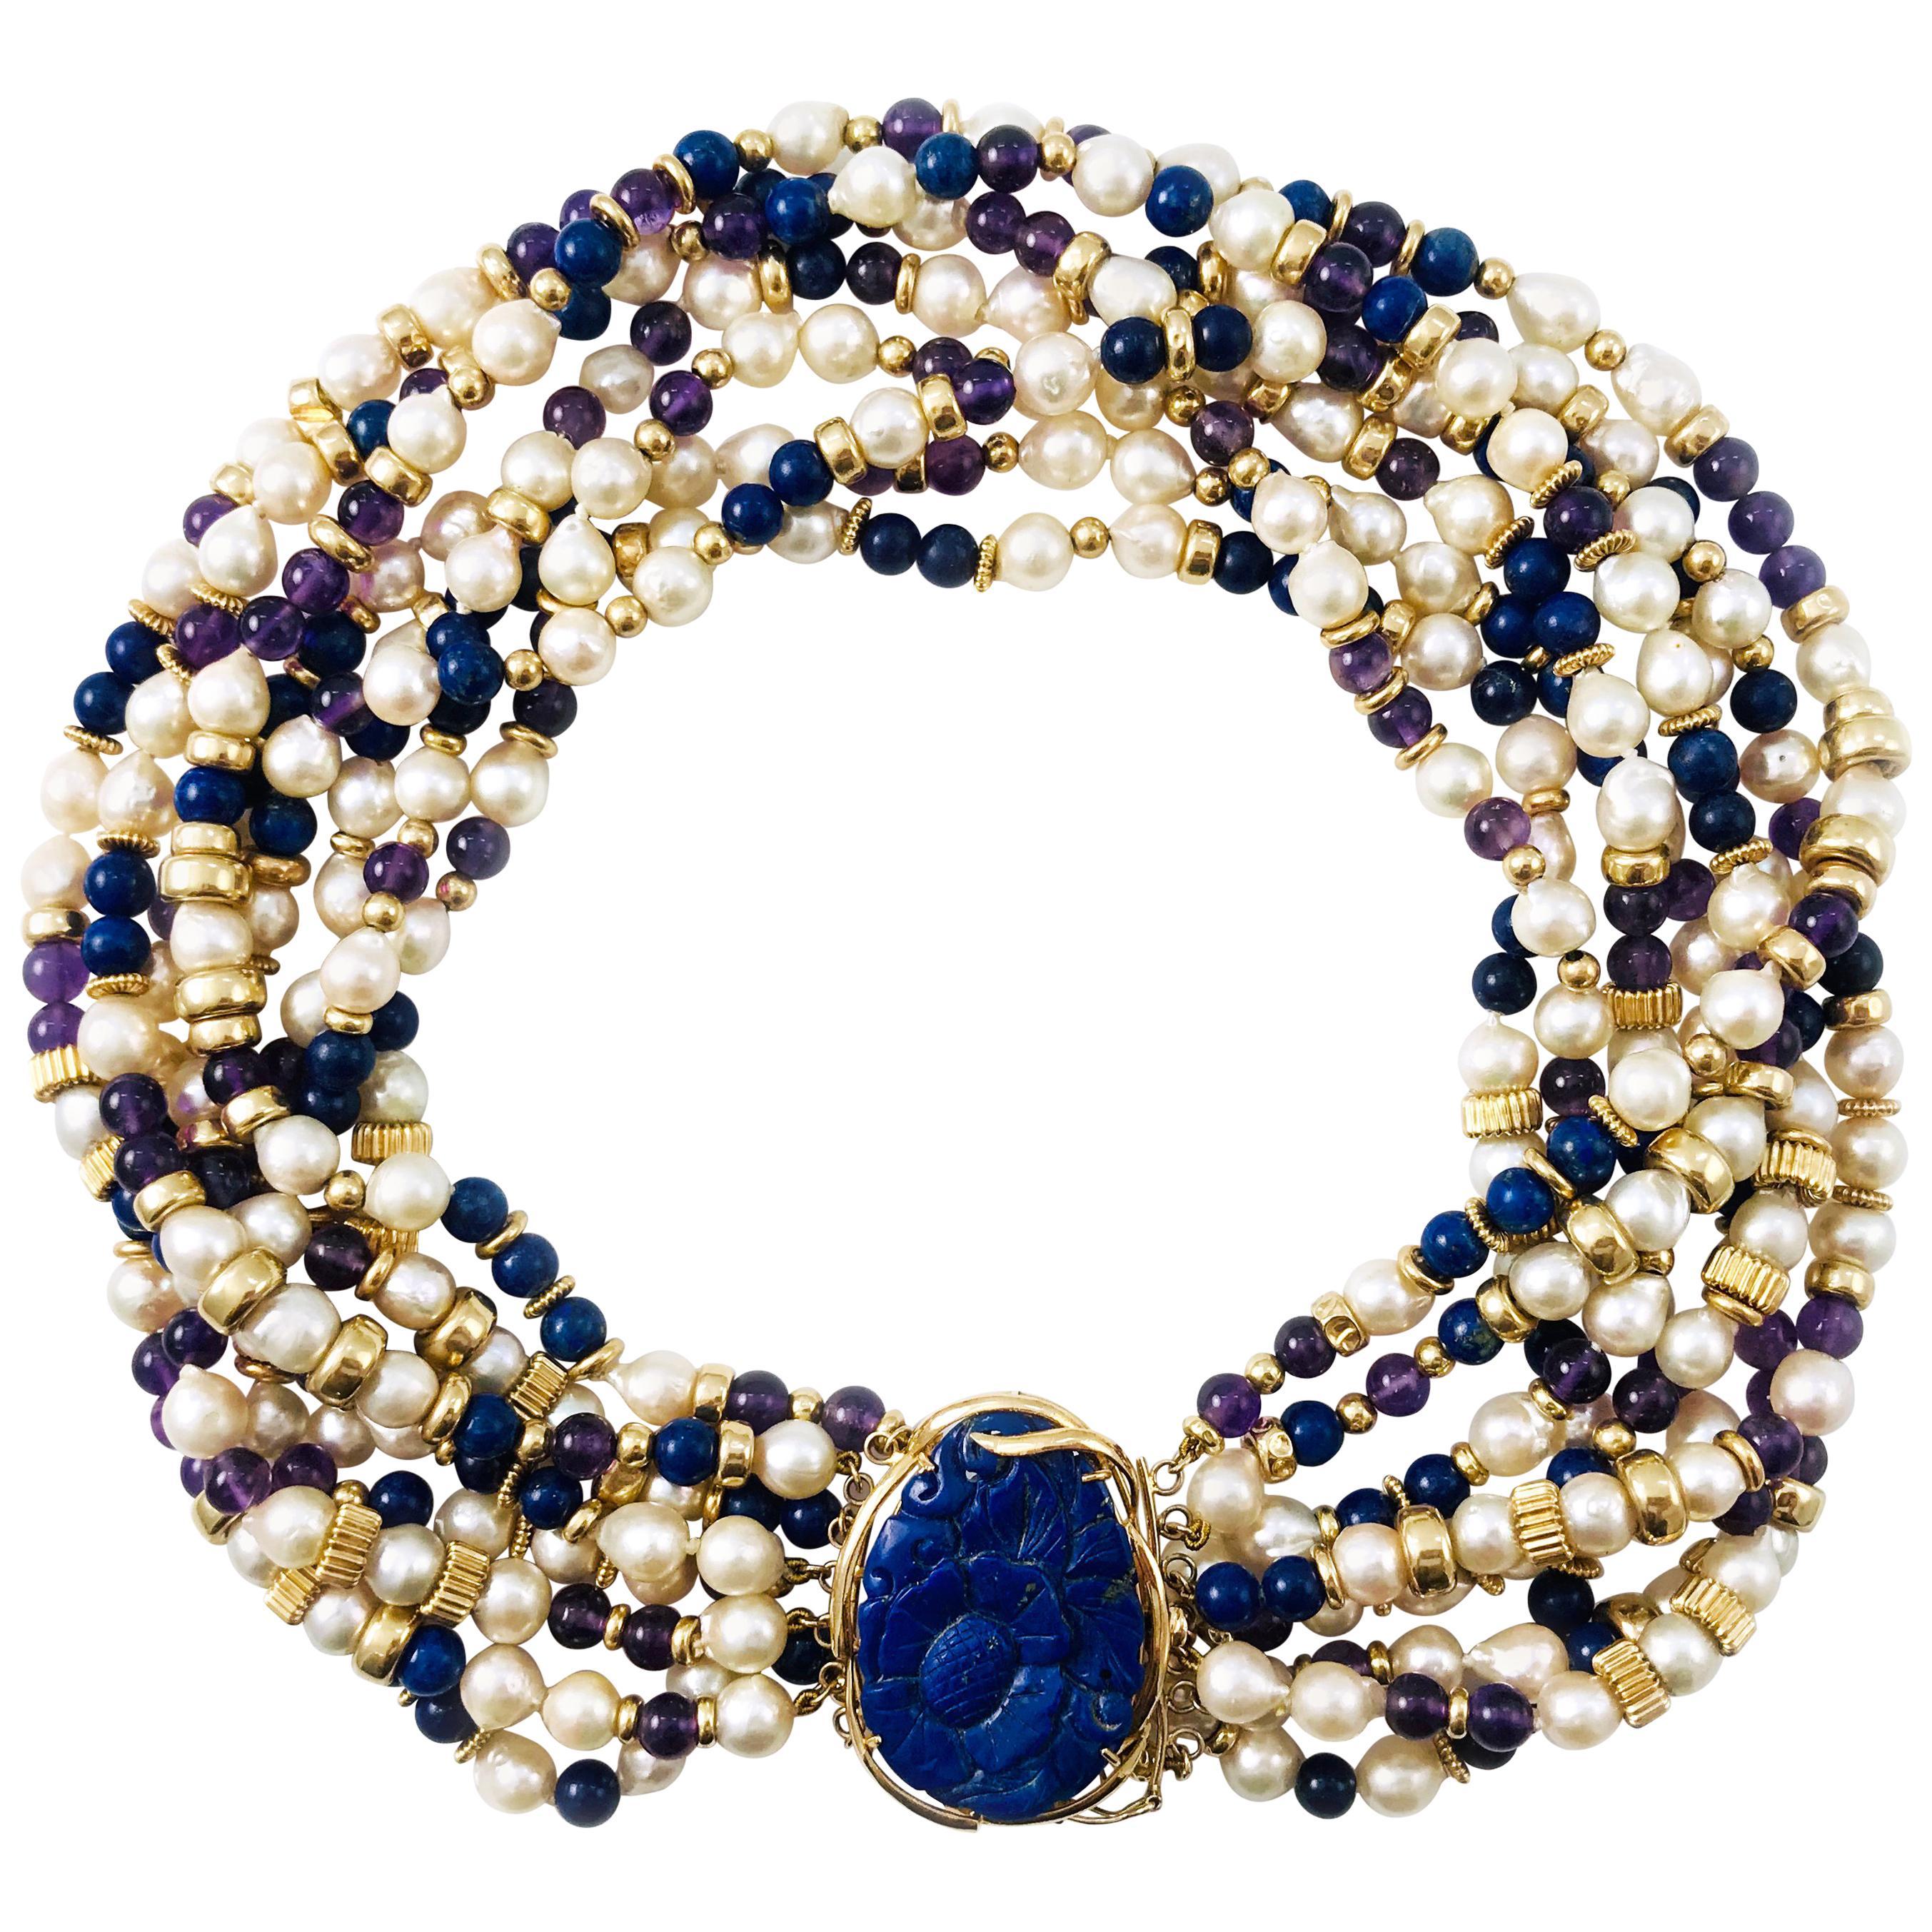 Lapis Lazuli Amethyst Pearl Choker Necklace